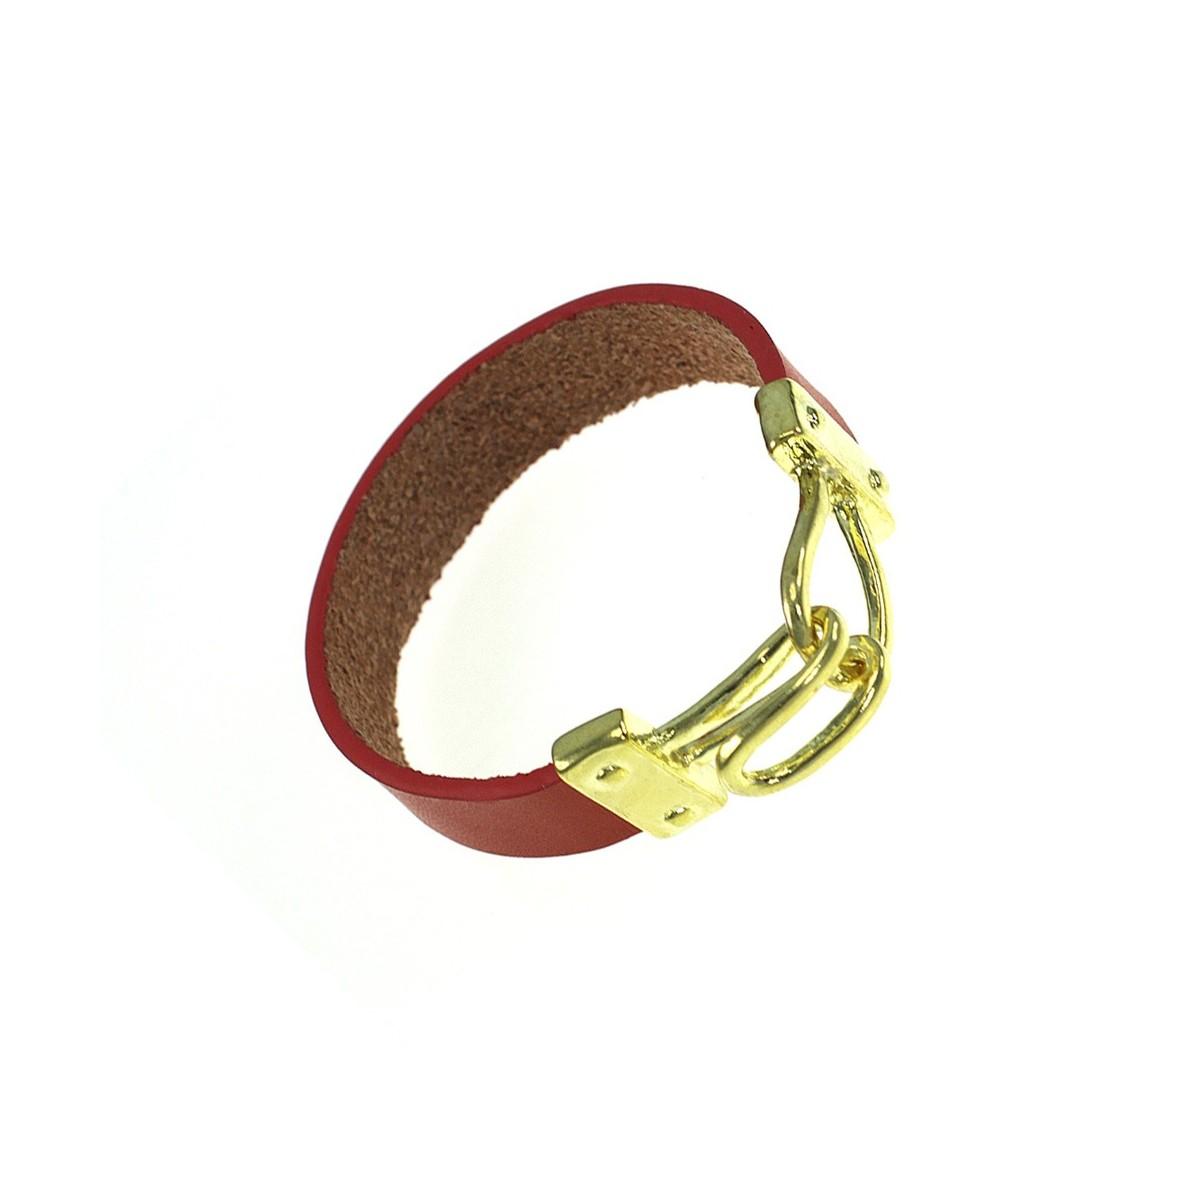 Bracelet en cuir véritable rouge